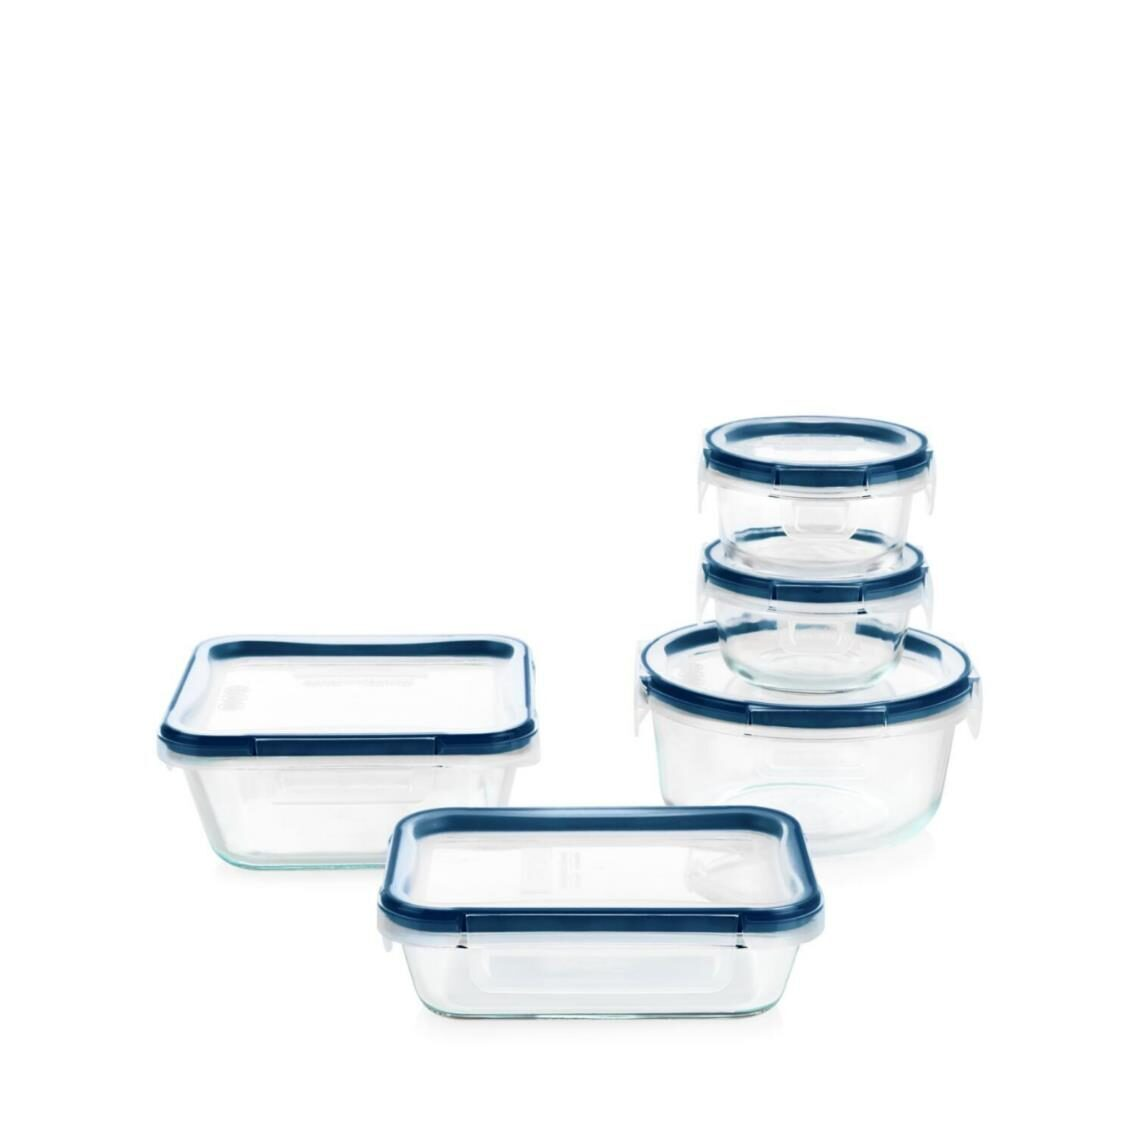 Pyrex FreshLock Plus Glass Storage with Microban 10pc Set